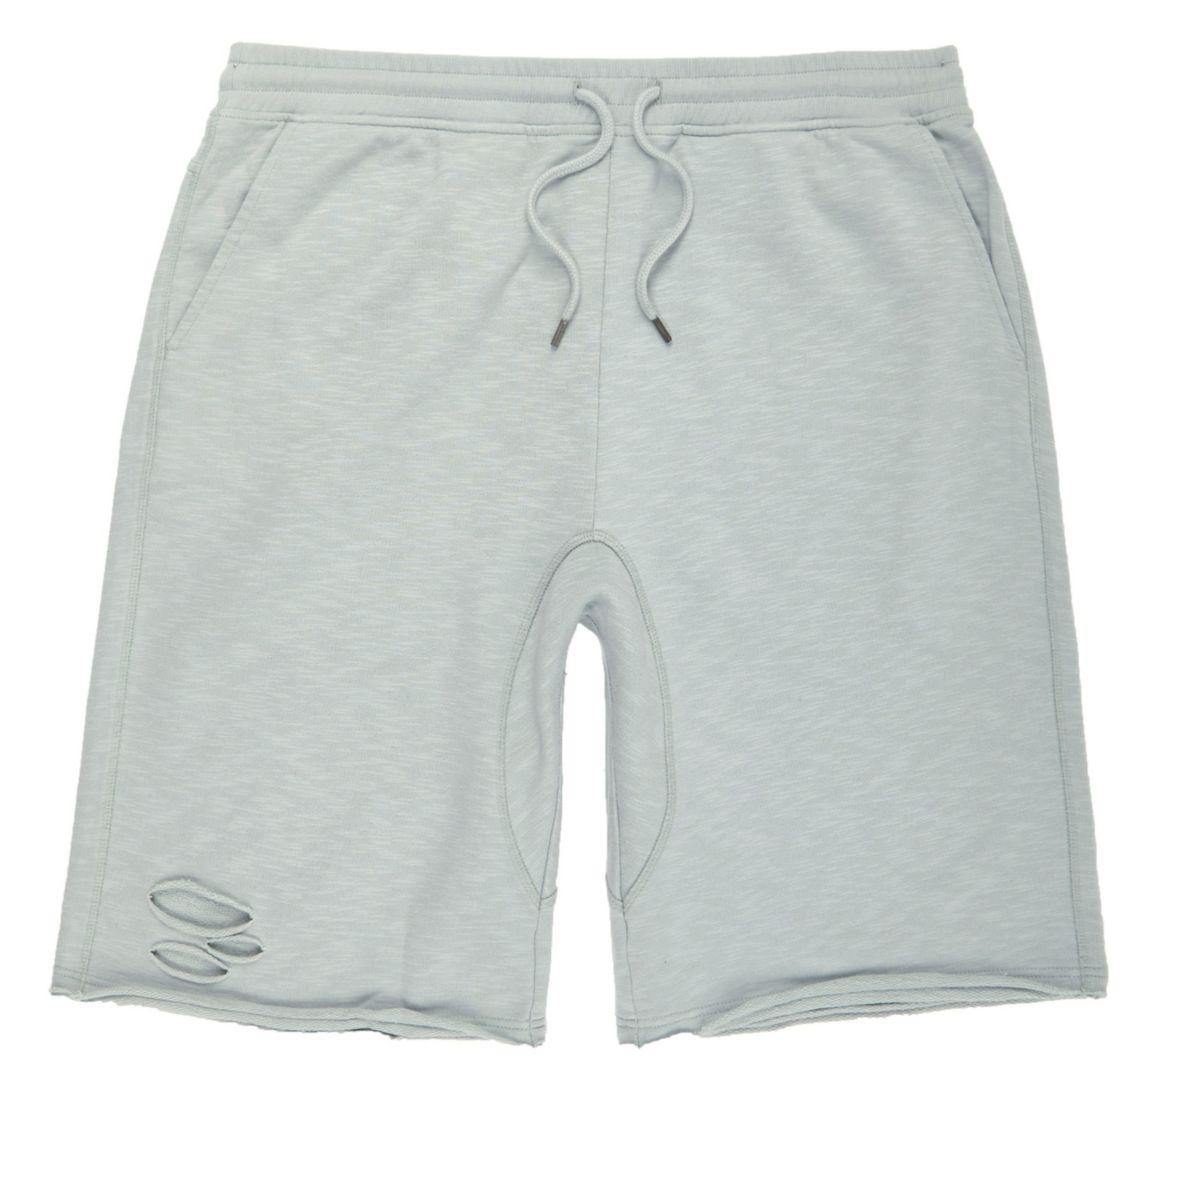 mint green slub ripped shorts - shorts - sale - men